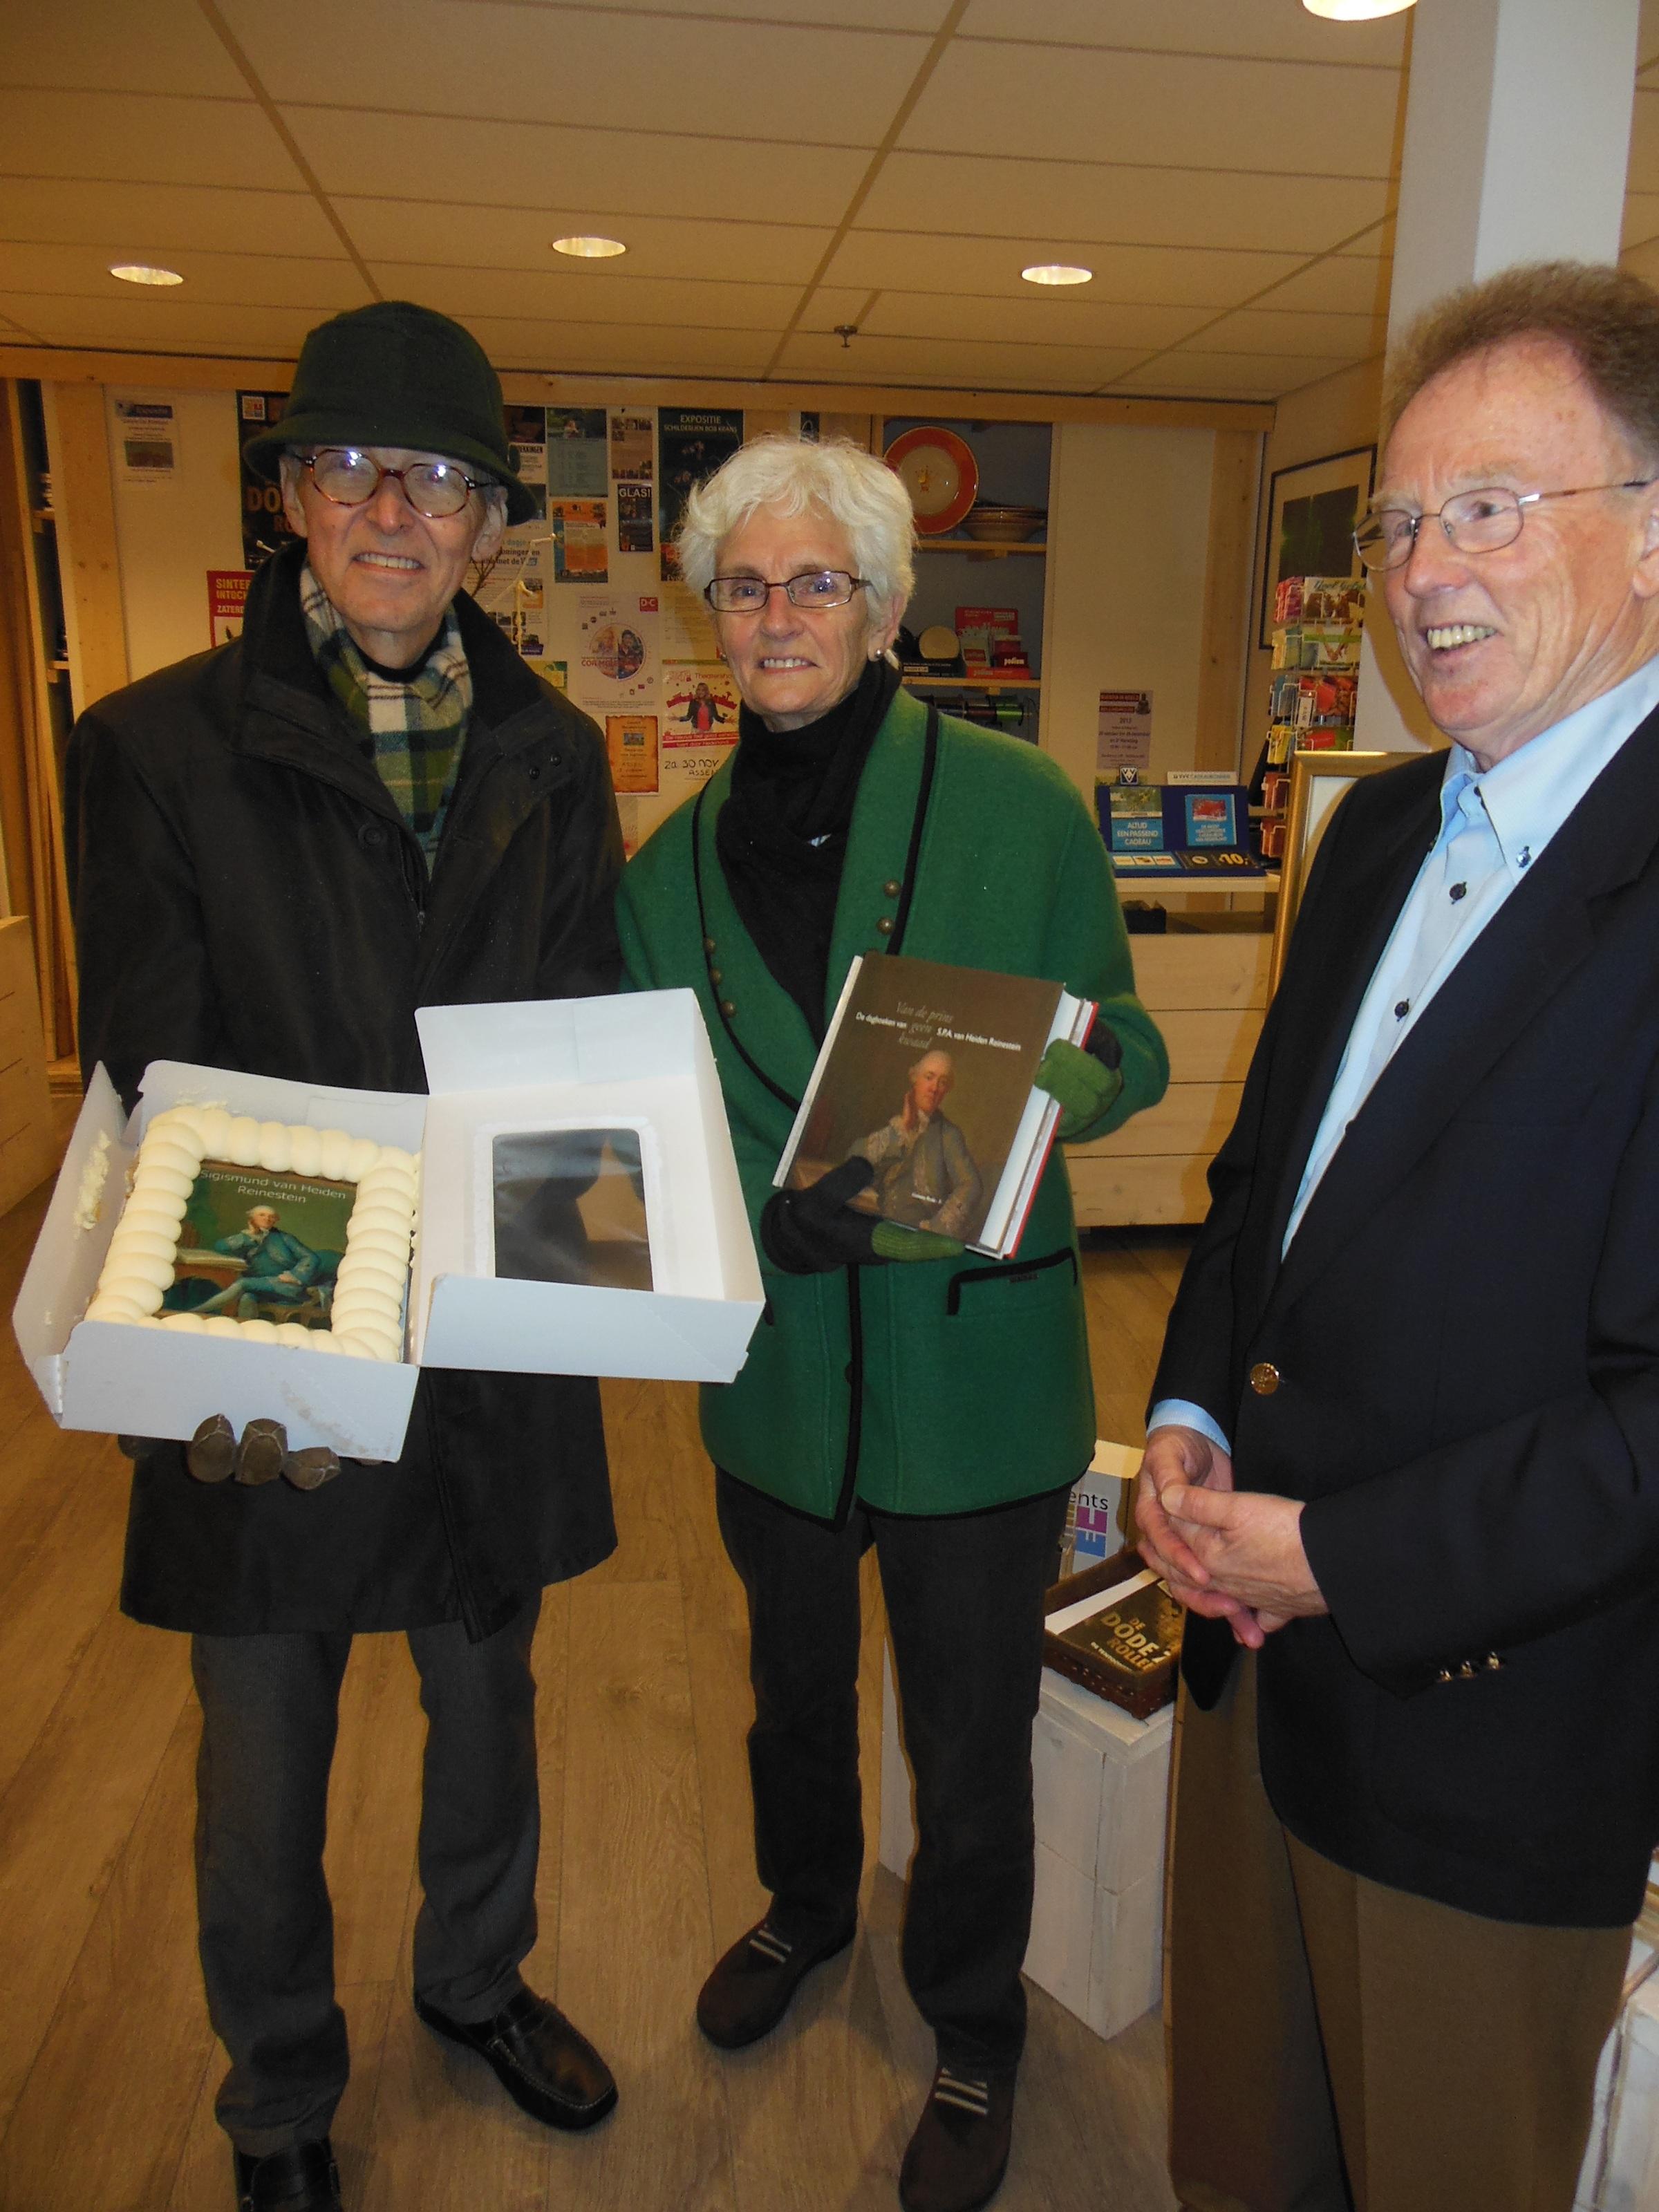 Familie Rutgers wint boek en taart van drost Sigismund (update fotos)